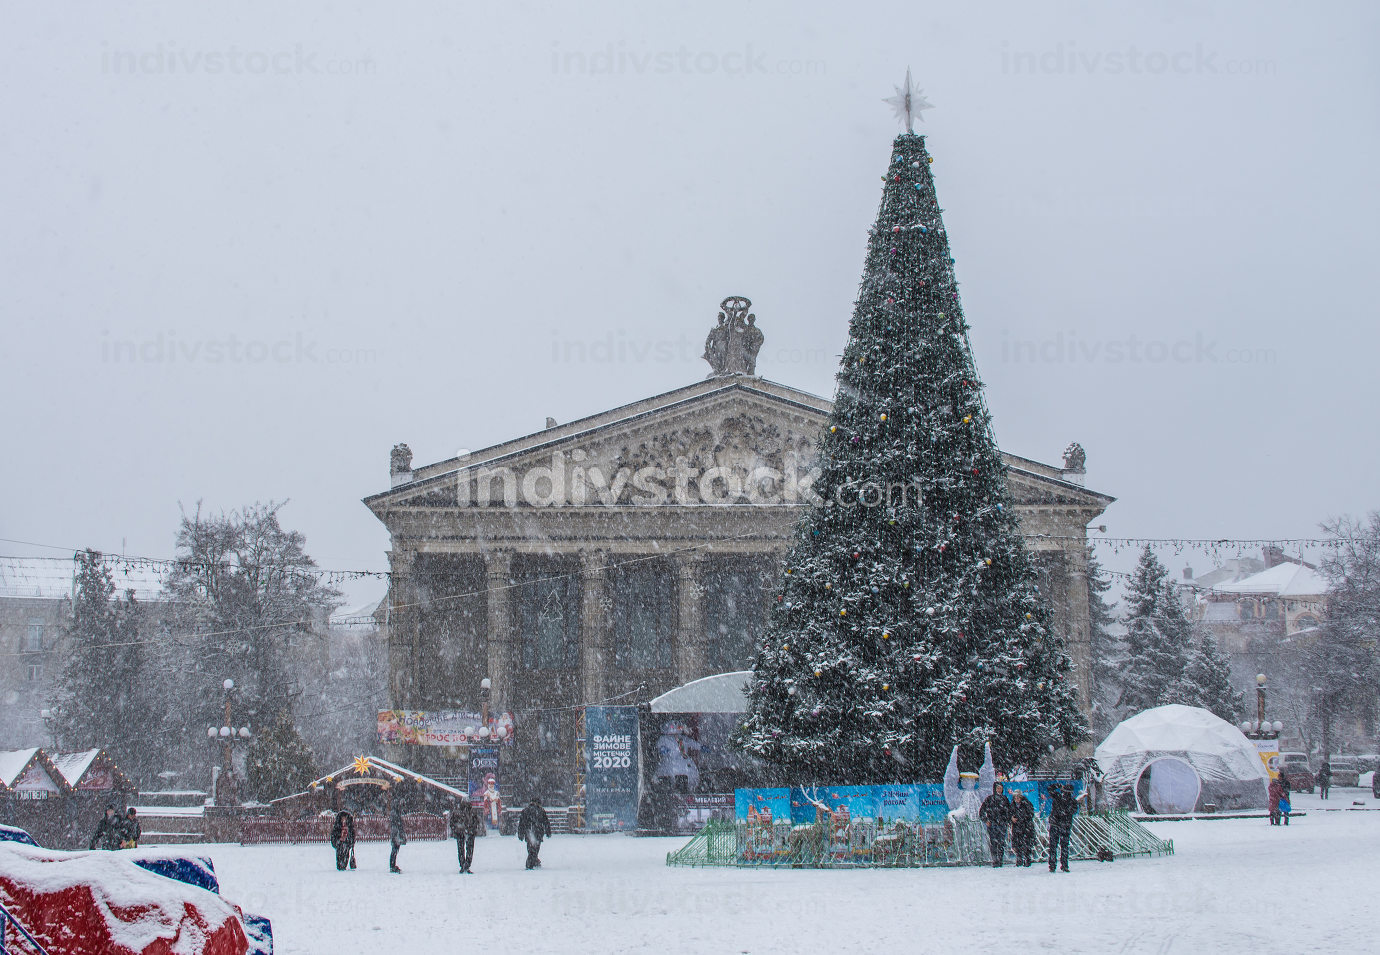 Ternopil, Ukraine 01.05.2020.  Volya Maidan and Danylo Halytskyi Monument in Ternopol, Ukraine, on a snowy winter morning